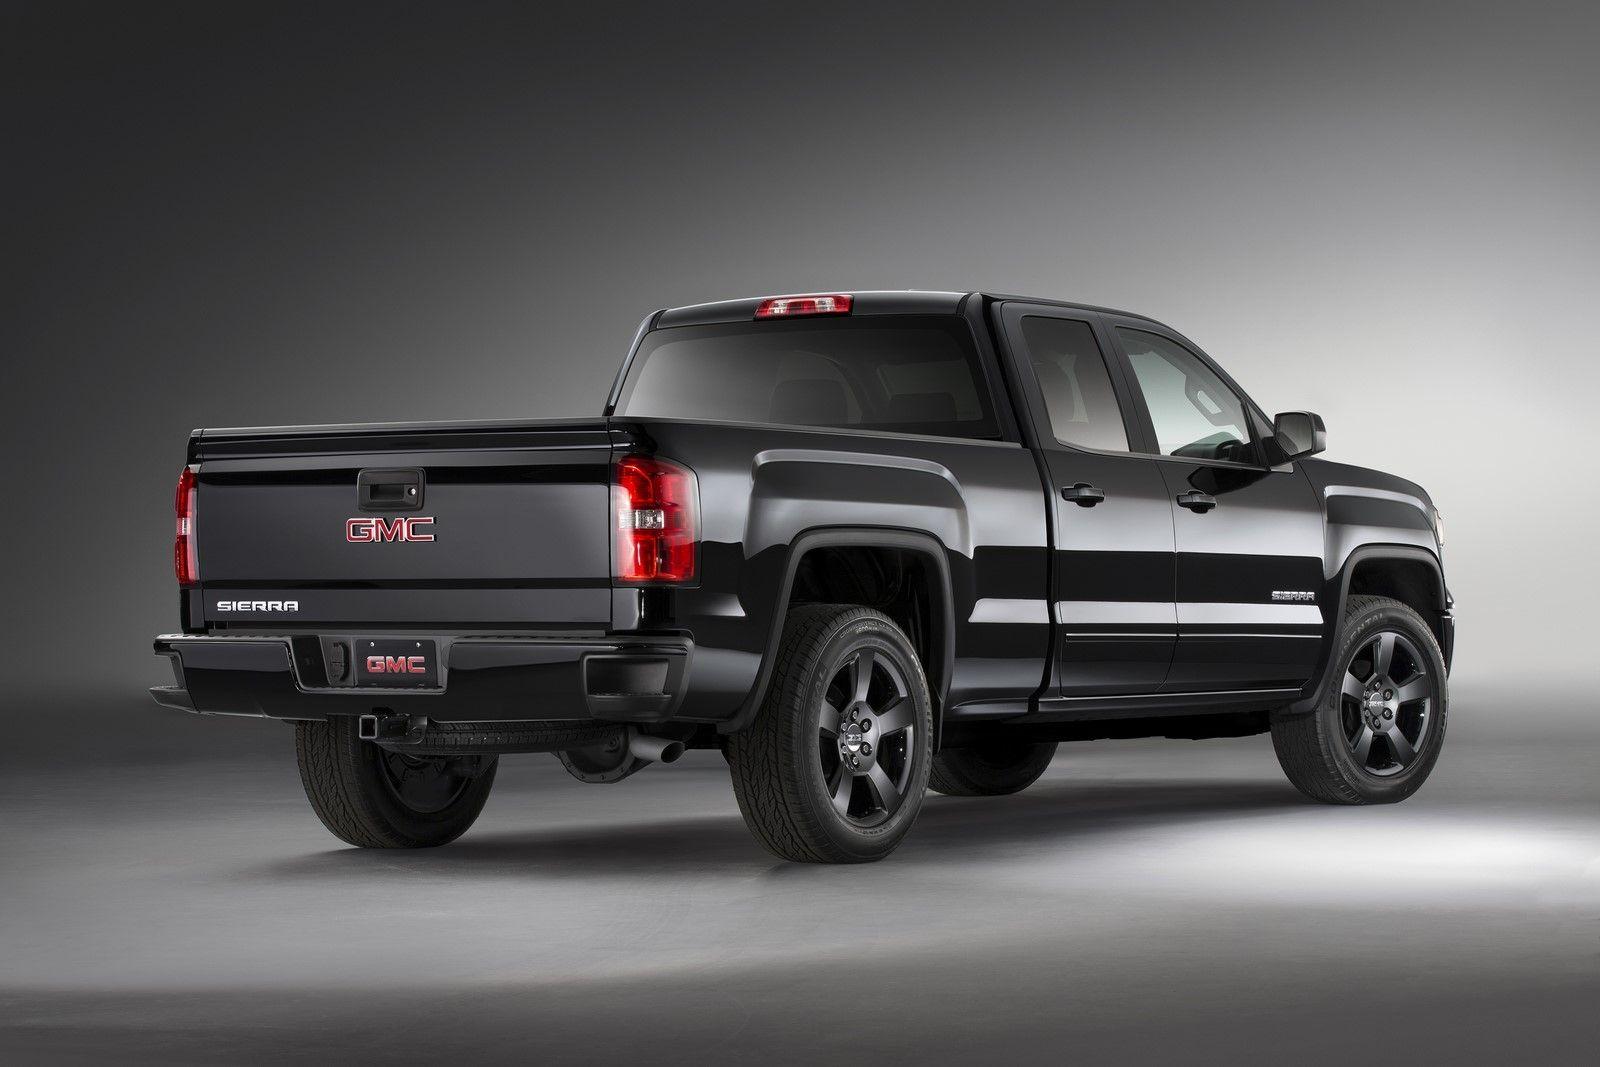 2015 Gmc Canyon Nightfall Edition Gallery New Chevrolet Trucks